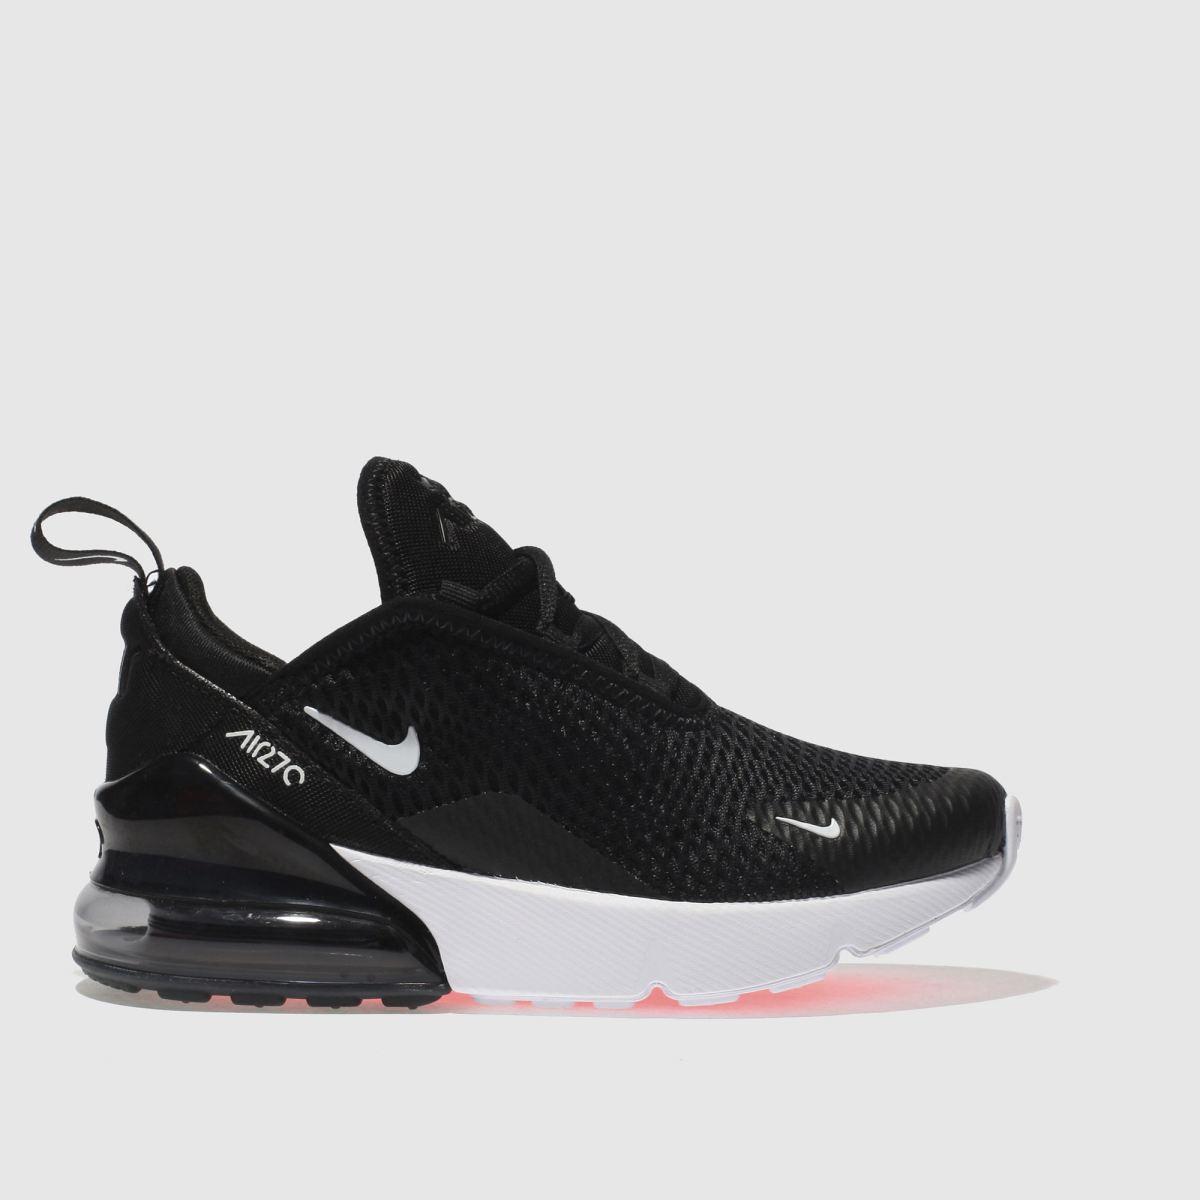 Nike Black & White Air Max 270 Trainers Junior